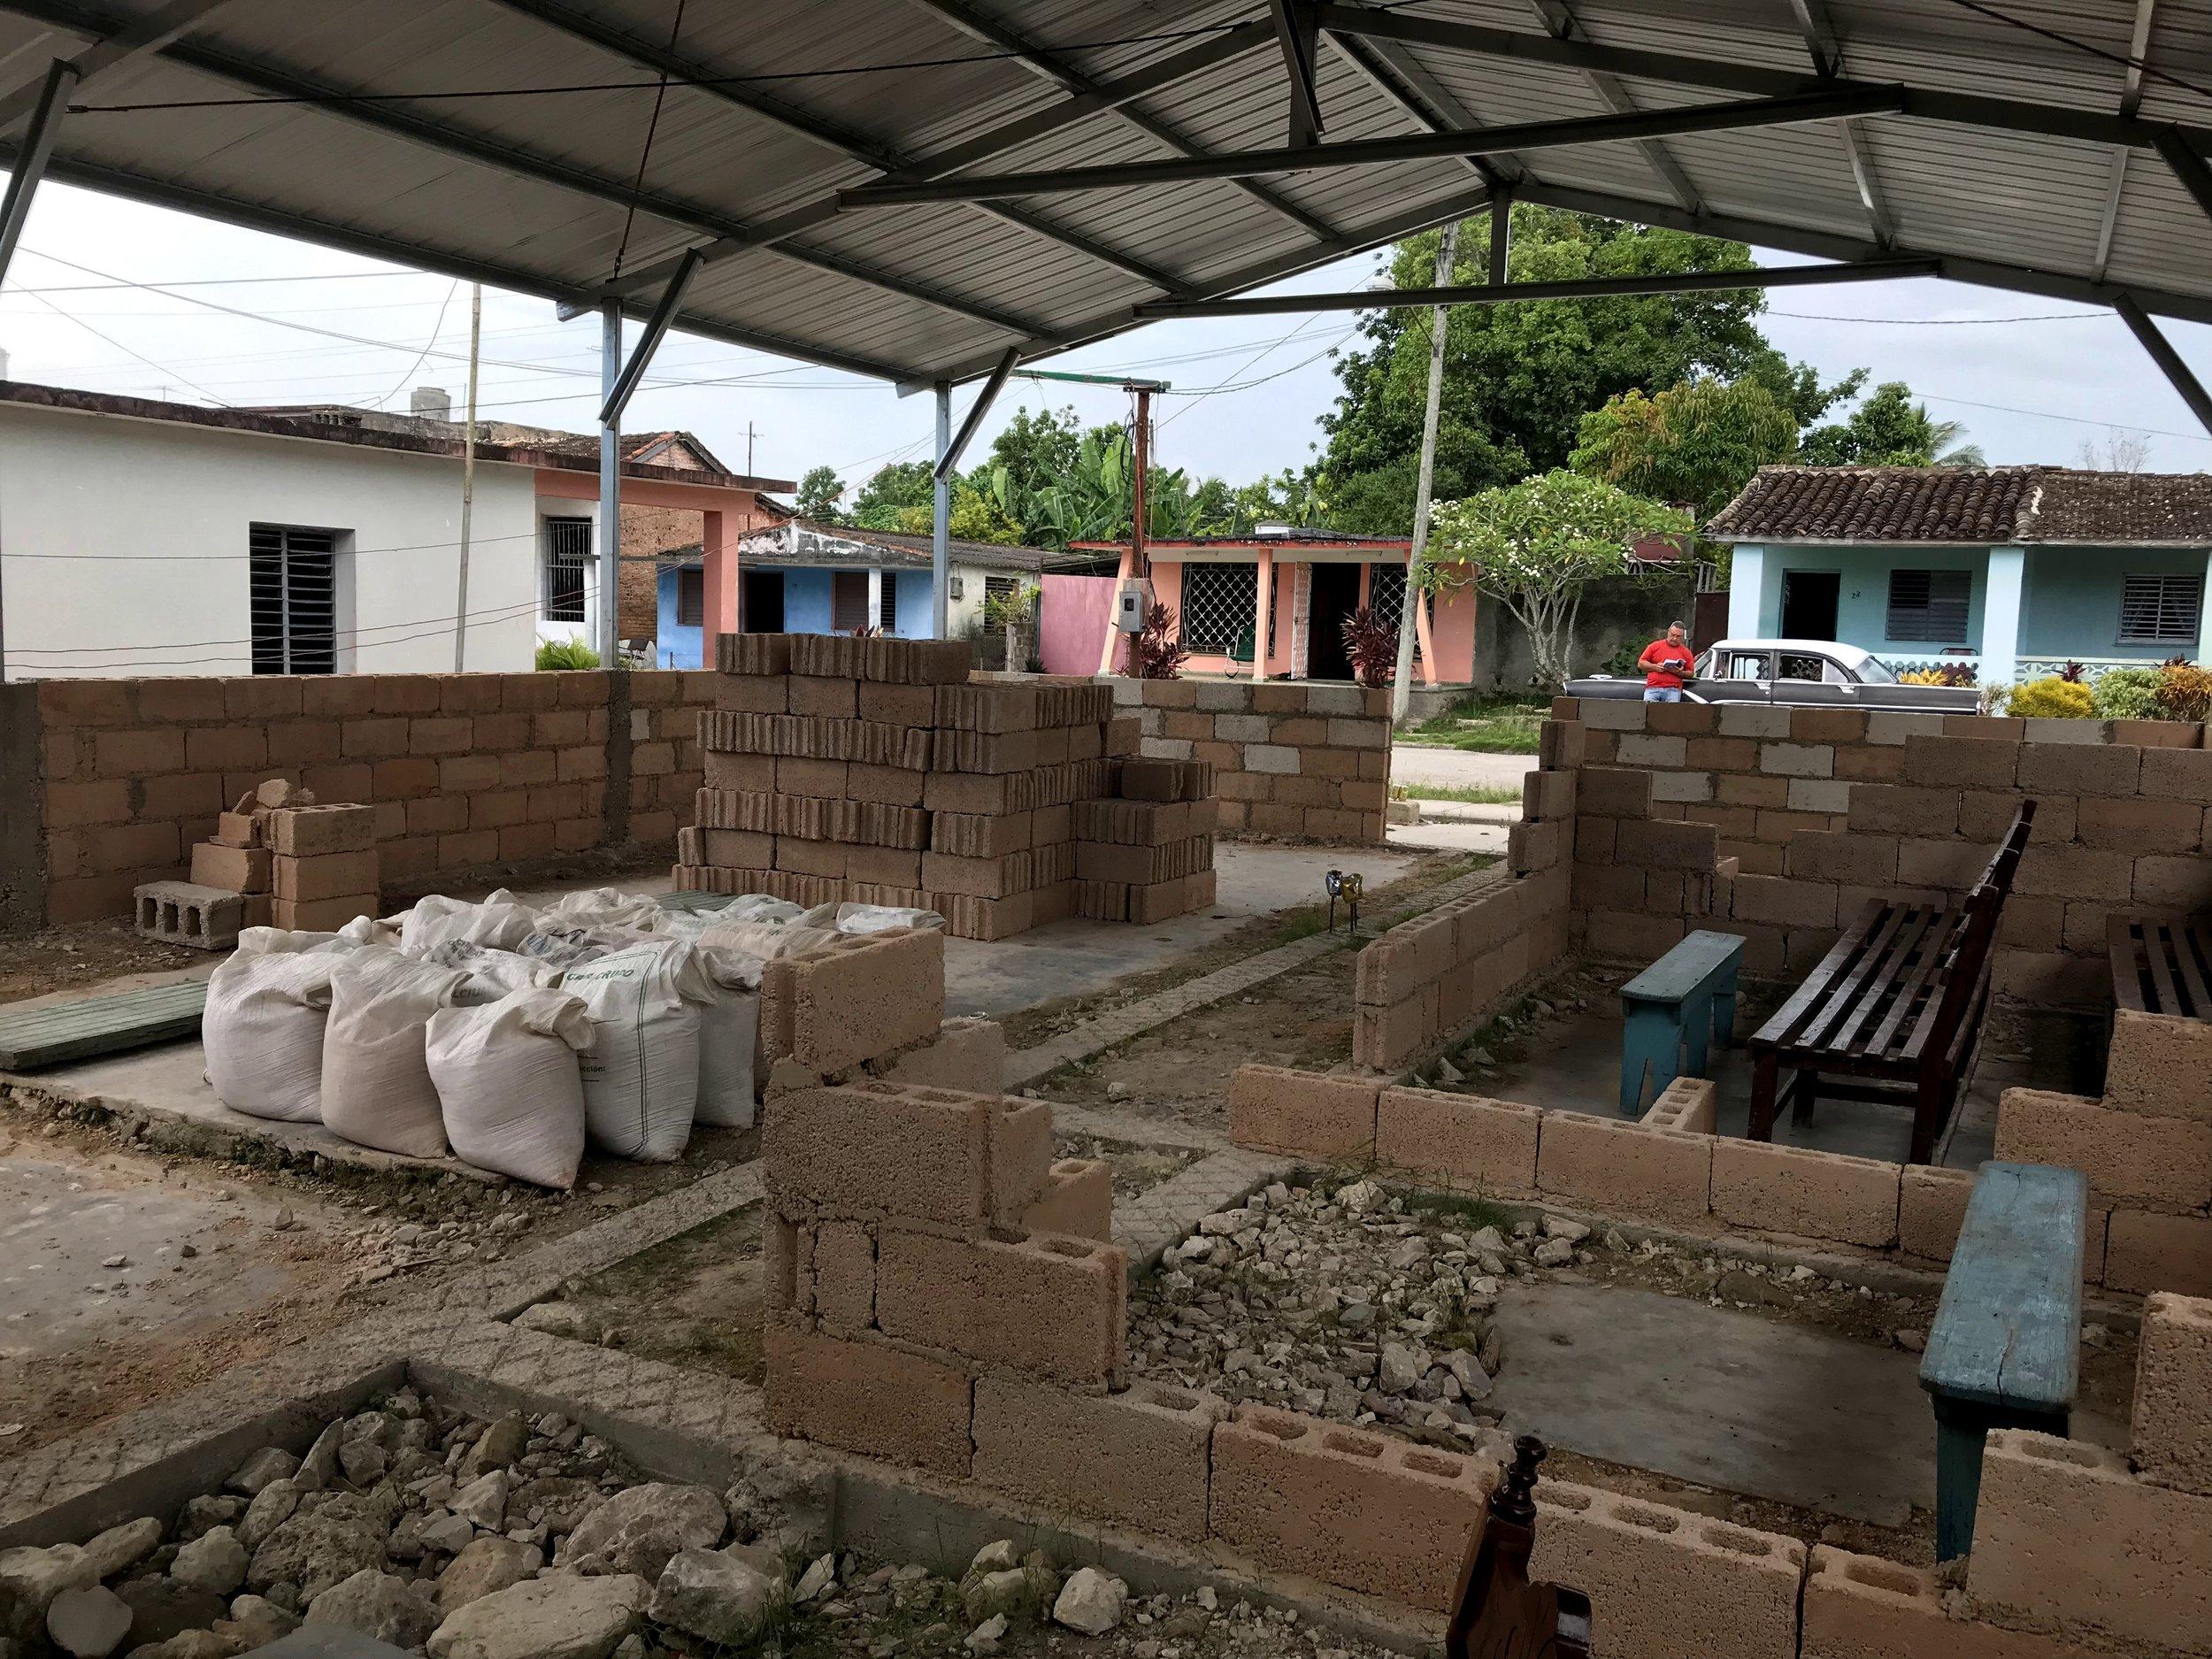 New Building Construction Underway